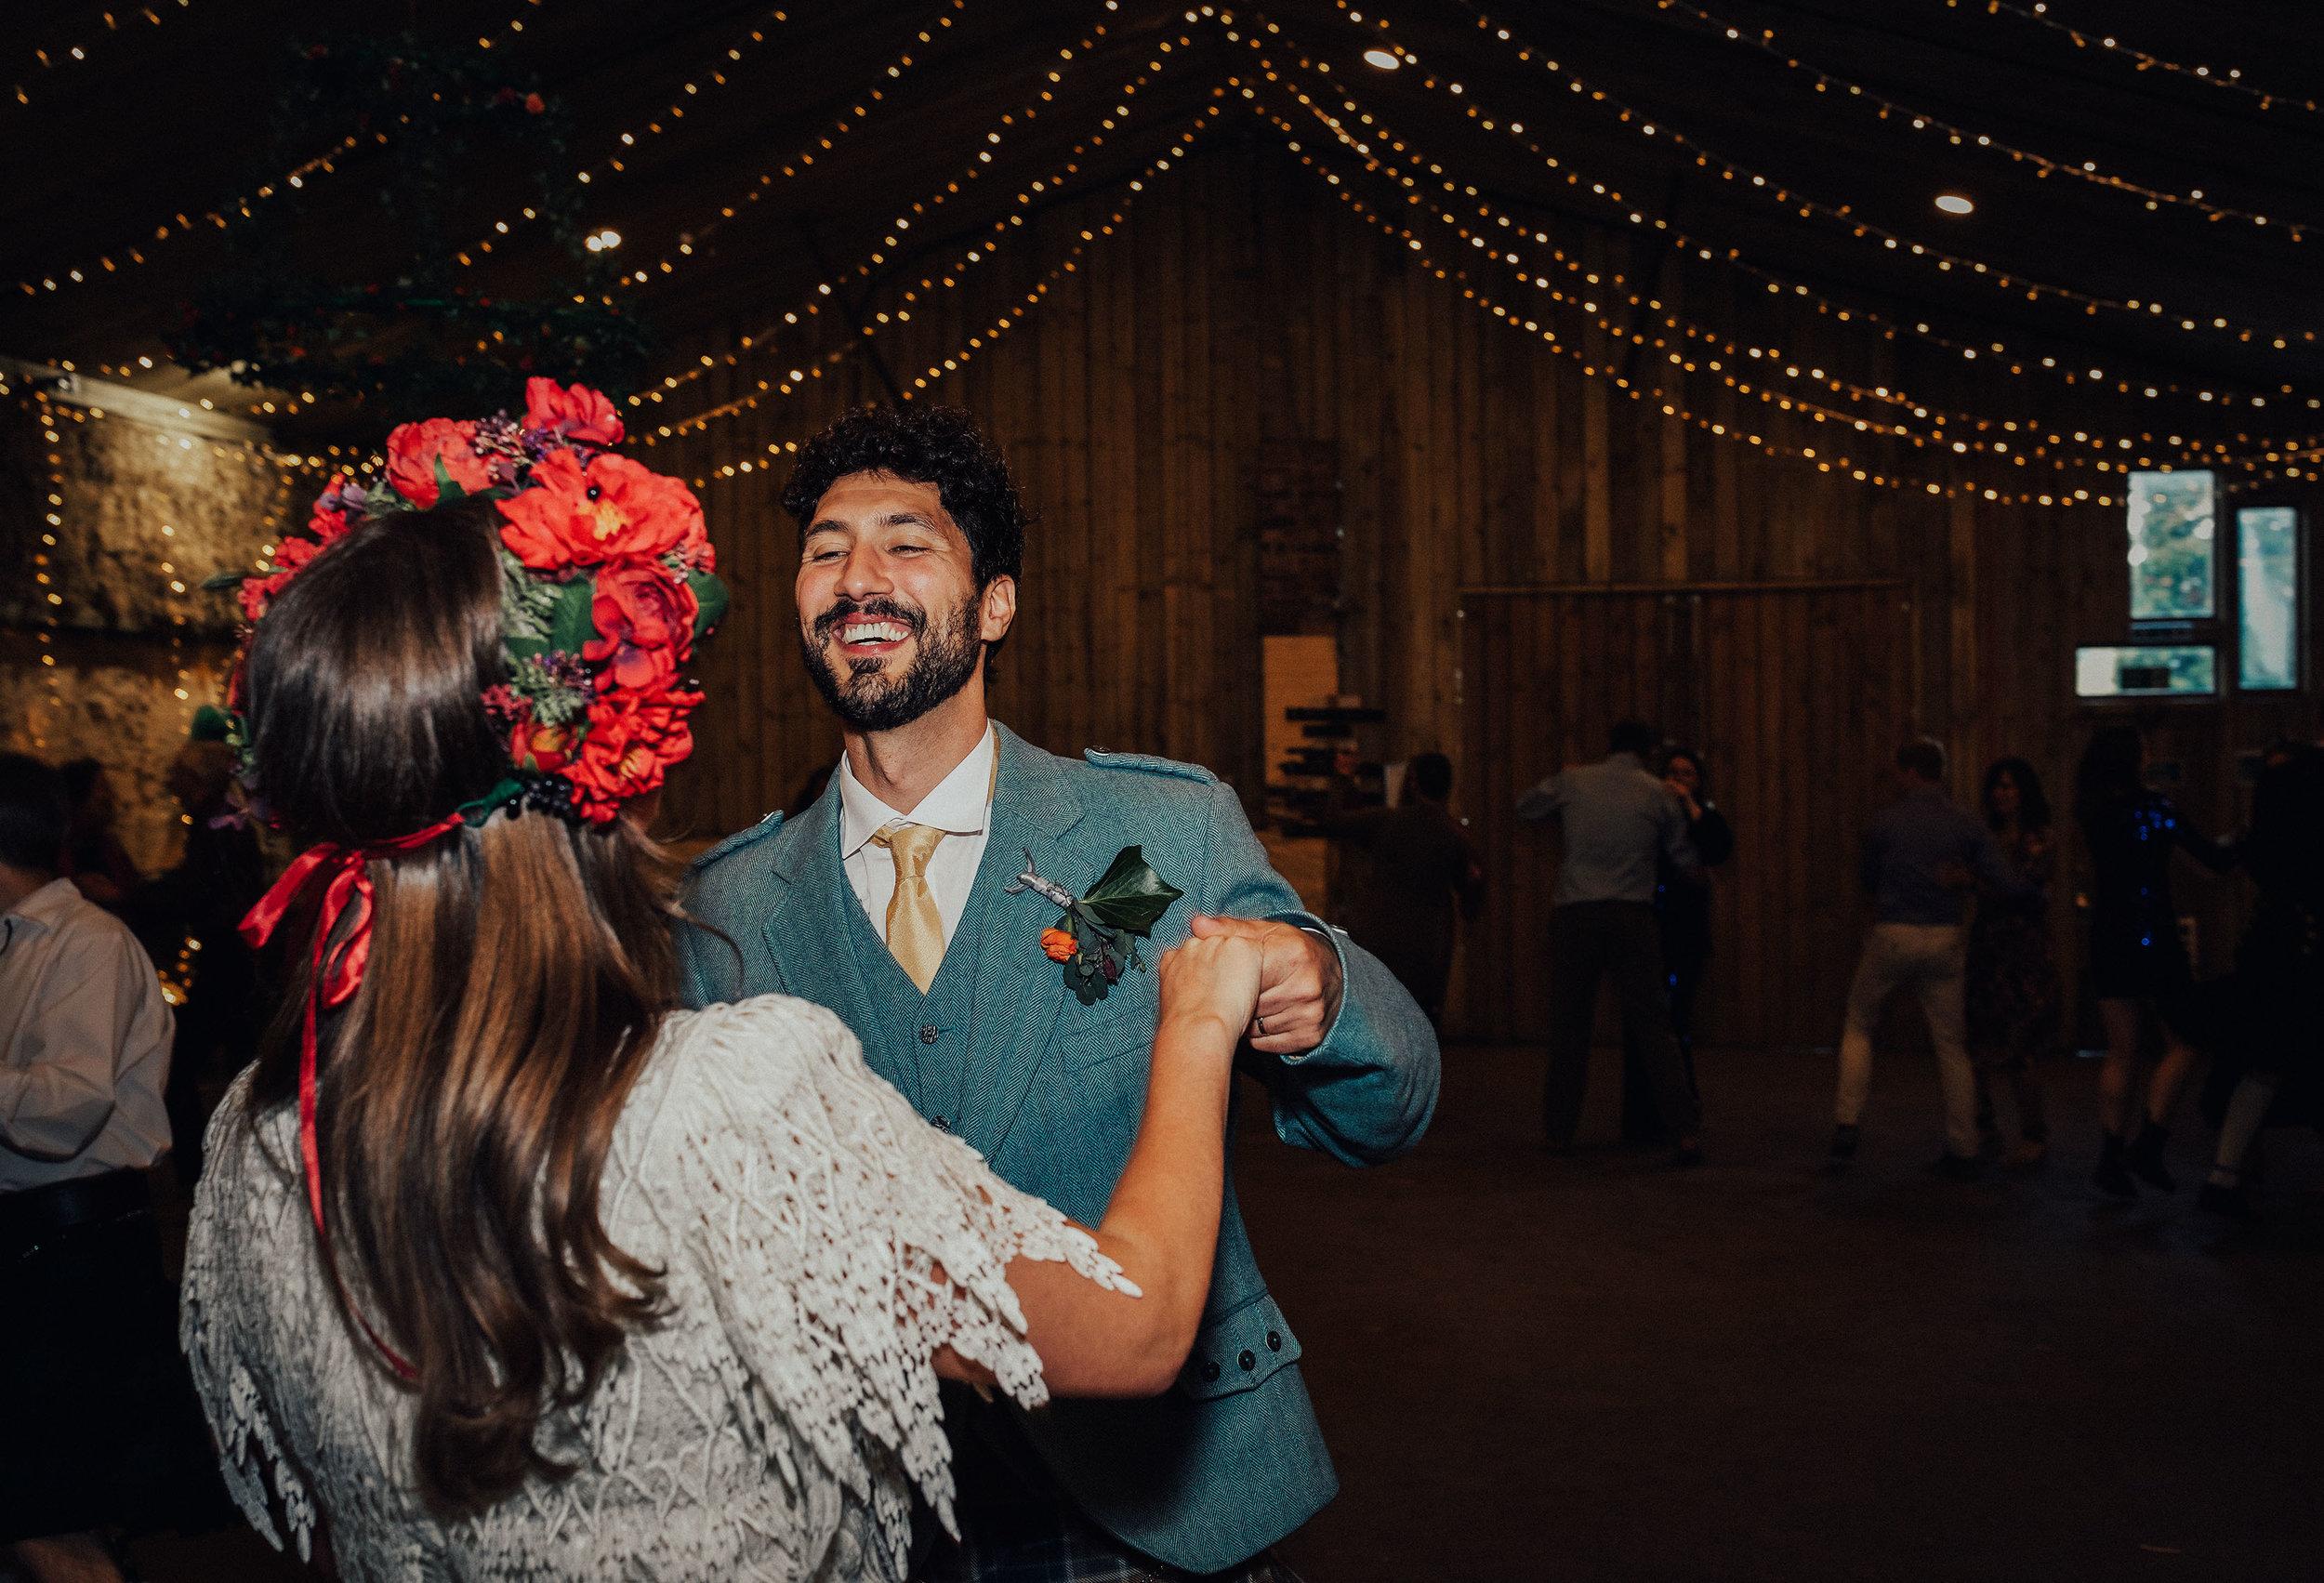 COMRIE_CROFT_WEDDINGS_PJ_PHILLIPS_PHOTOGRAPHY_175.jpg